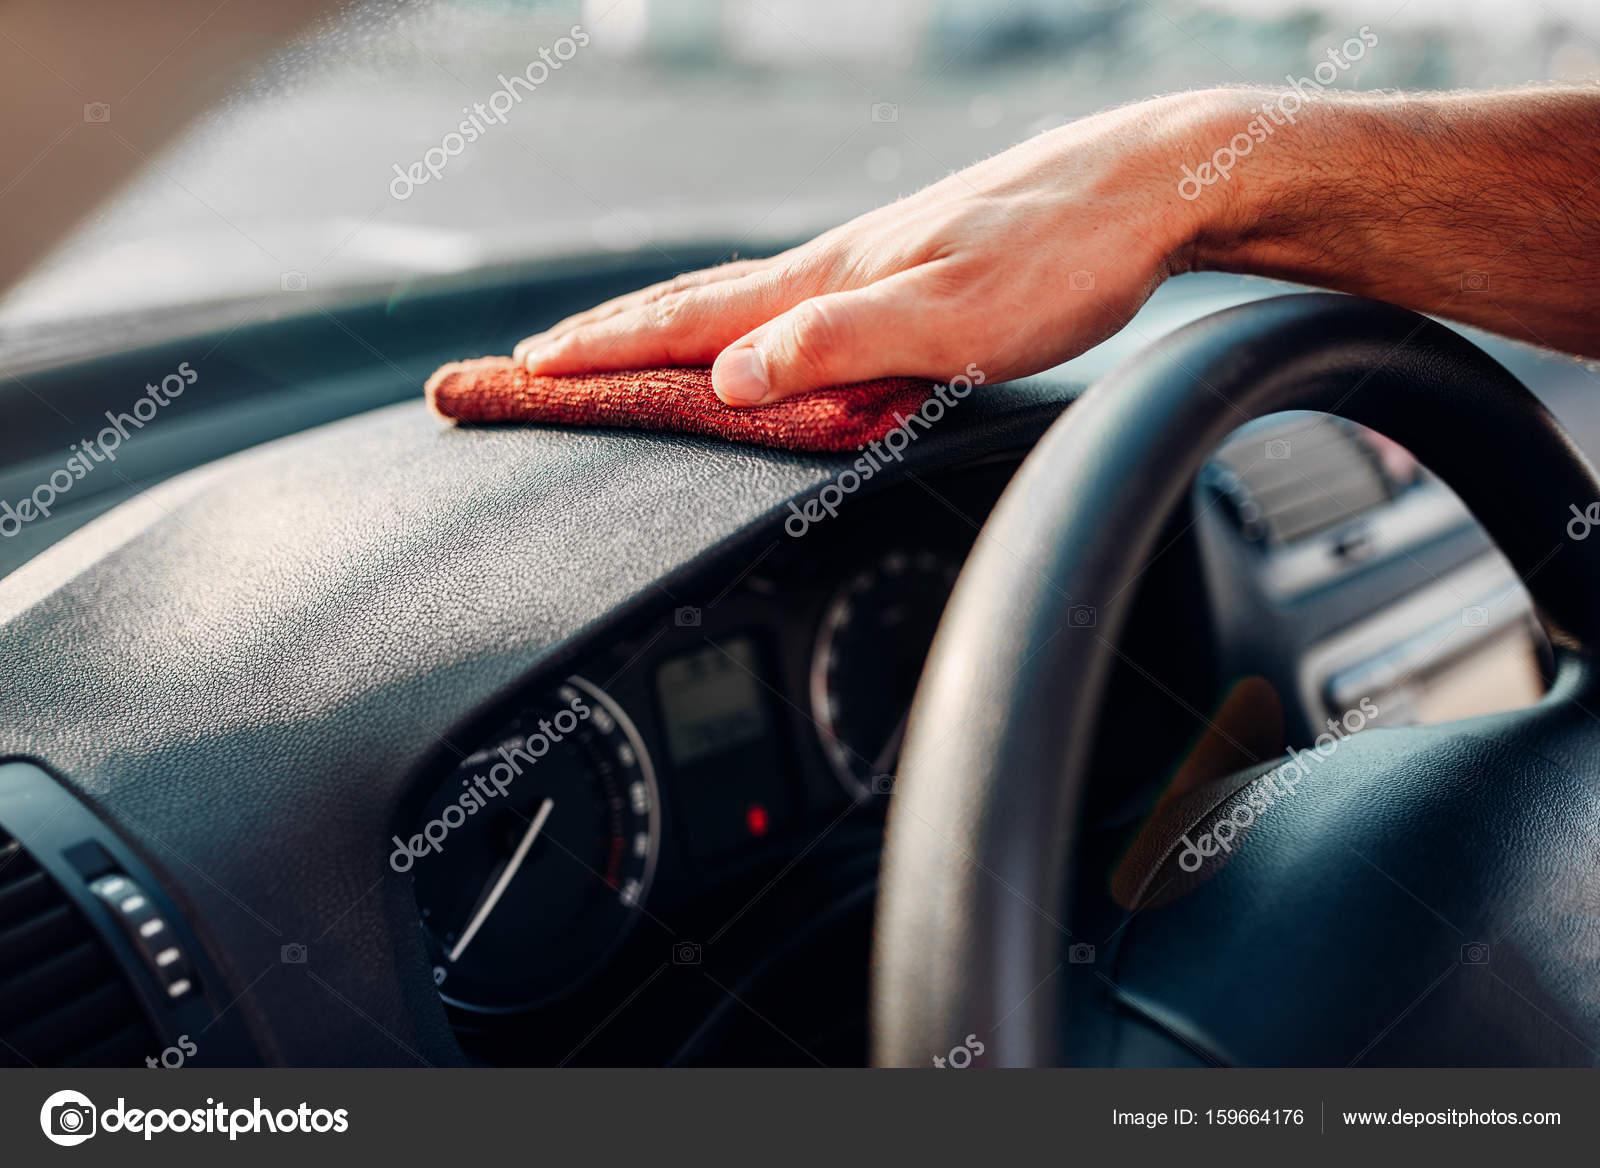 https://st3.depositphotos.com/1006542/15966/i/1600/depositphotos_159664176-stockafbeelding-man-schoonmaken-auto-interieur.jpg